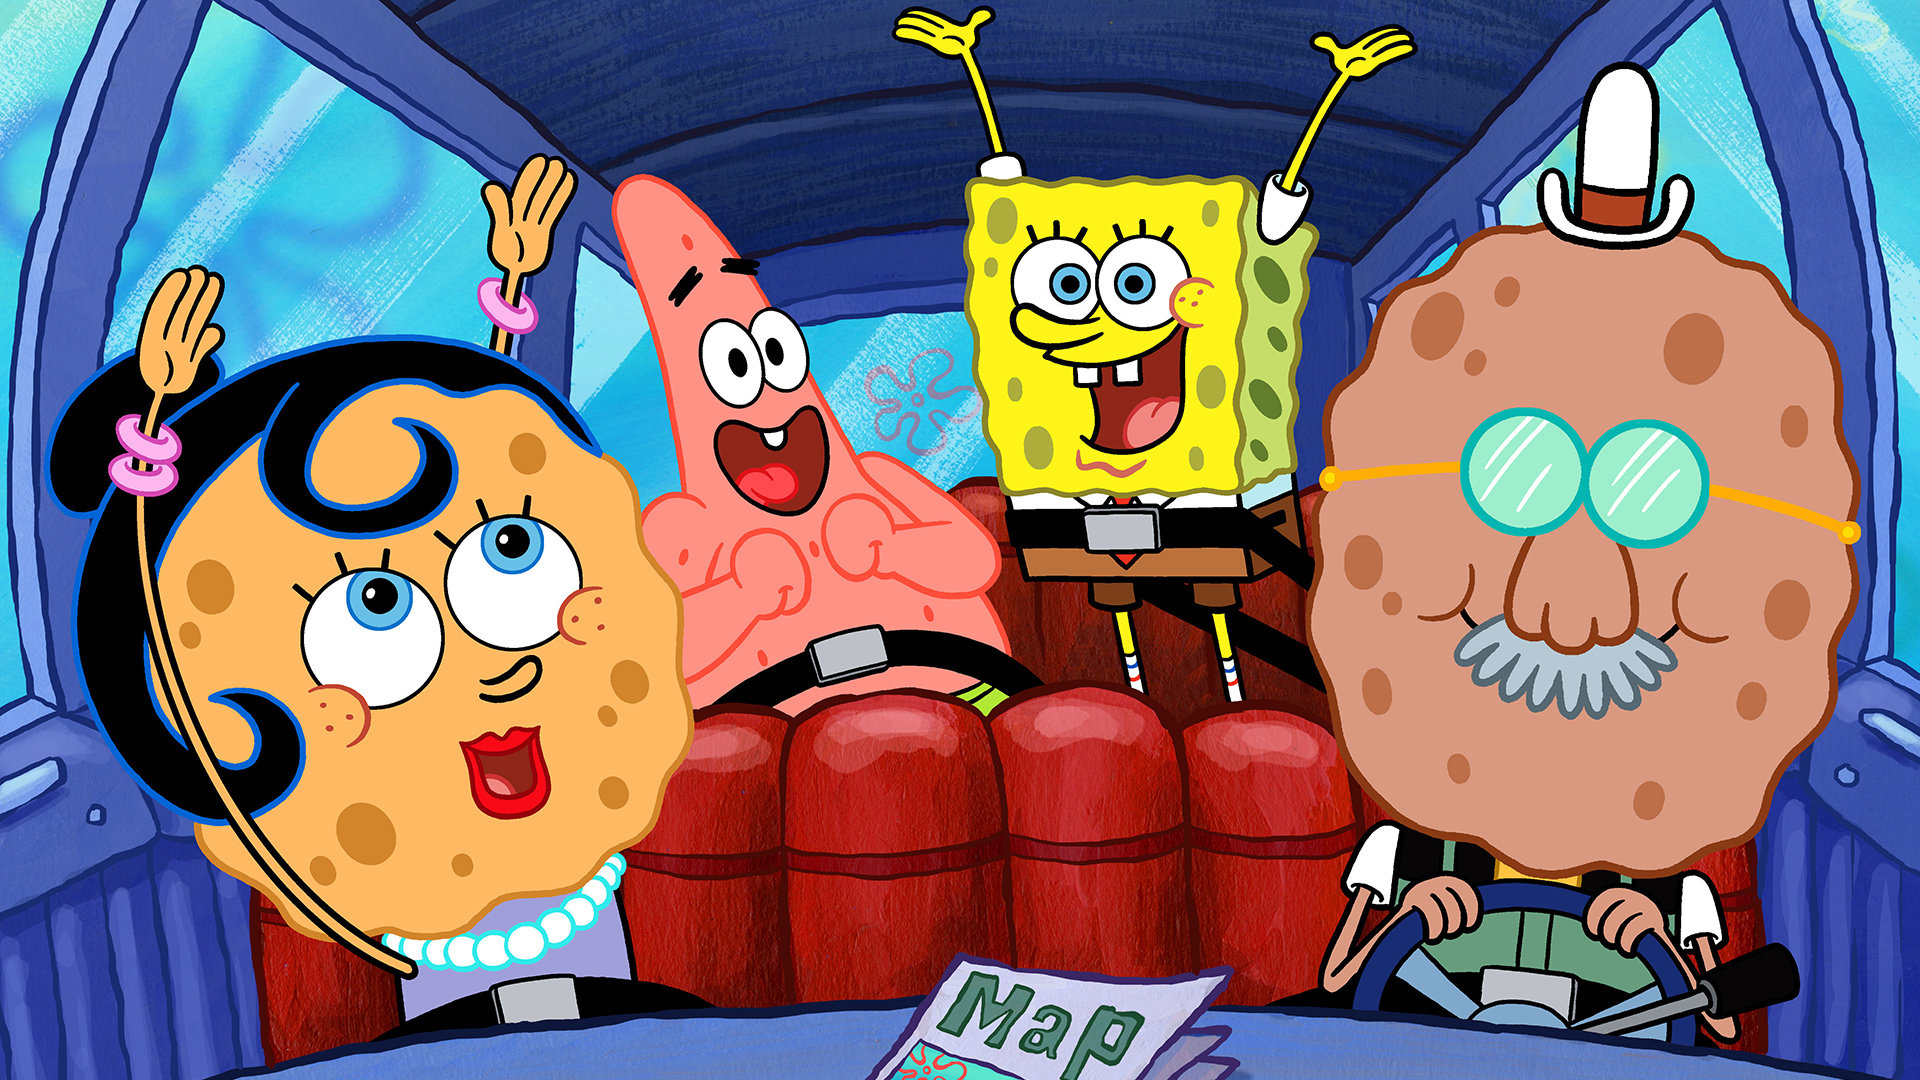 High Resolution Spongebob Squarepants Full Hd 1920x1080 Wallpaper Id